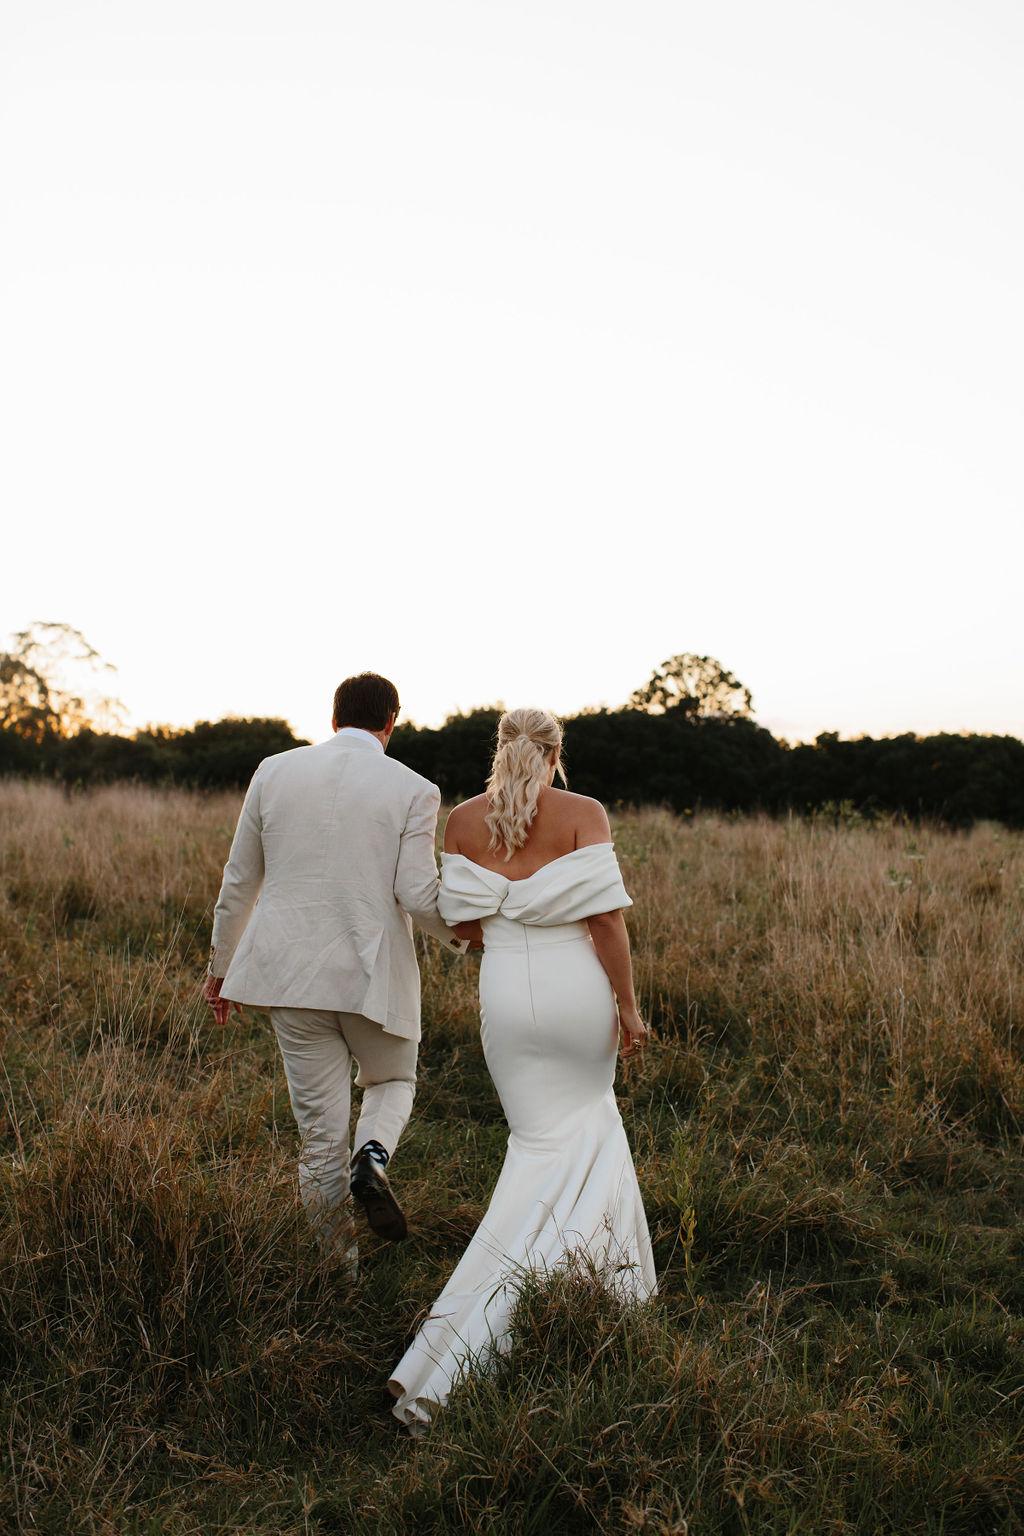 Arabella & Sam   Married at EarthHouse Byron Bay